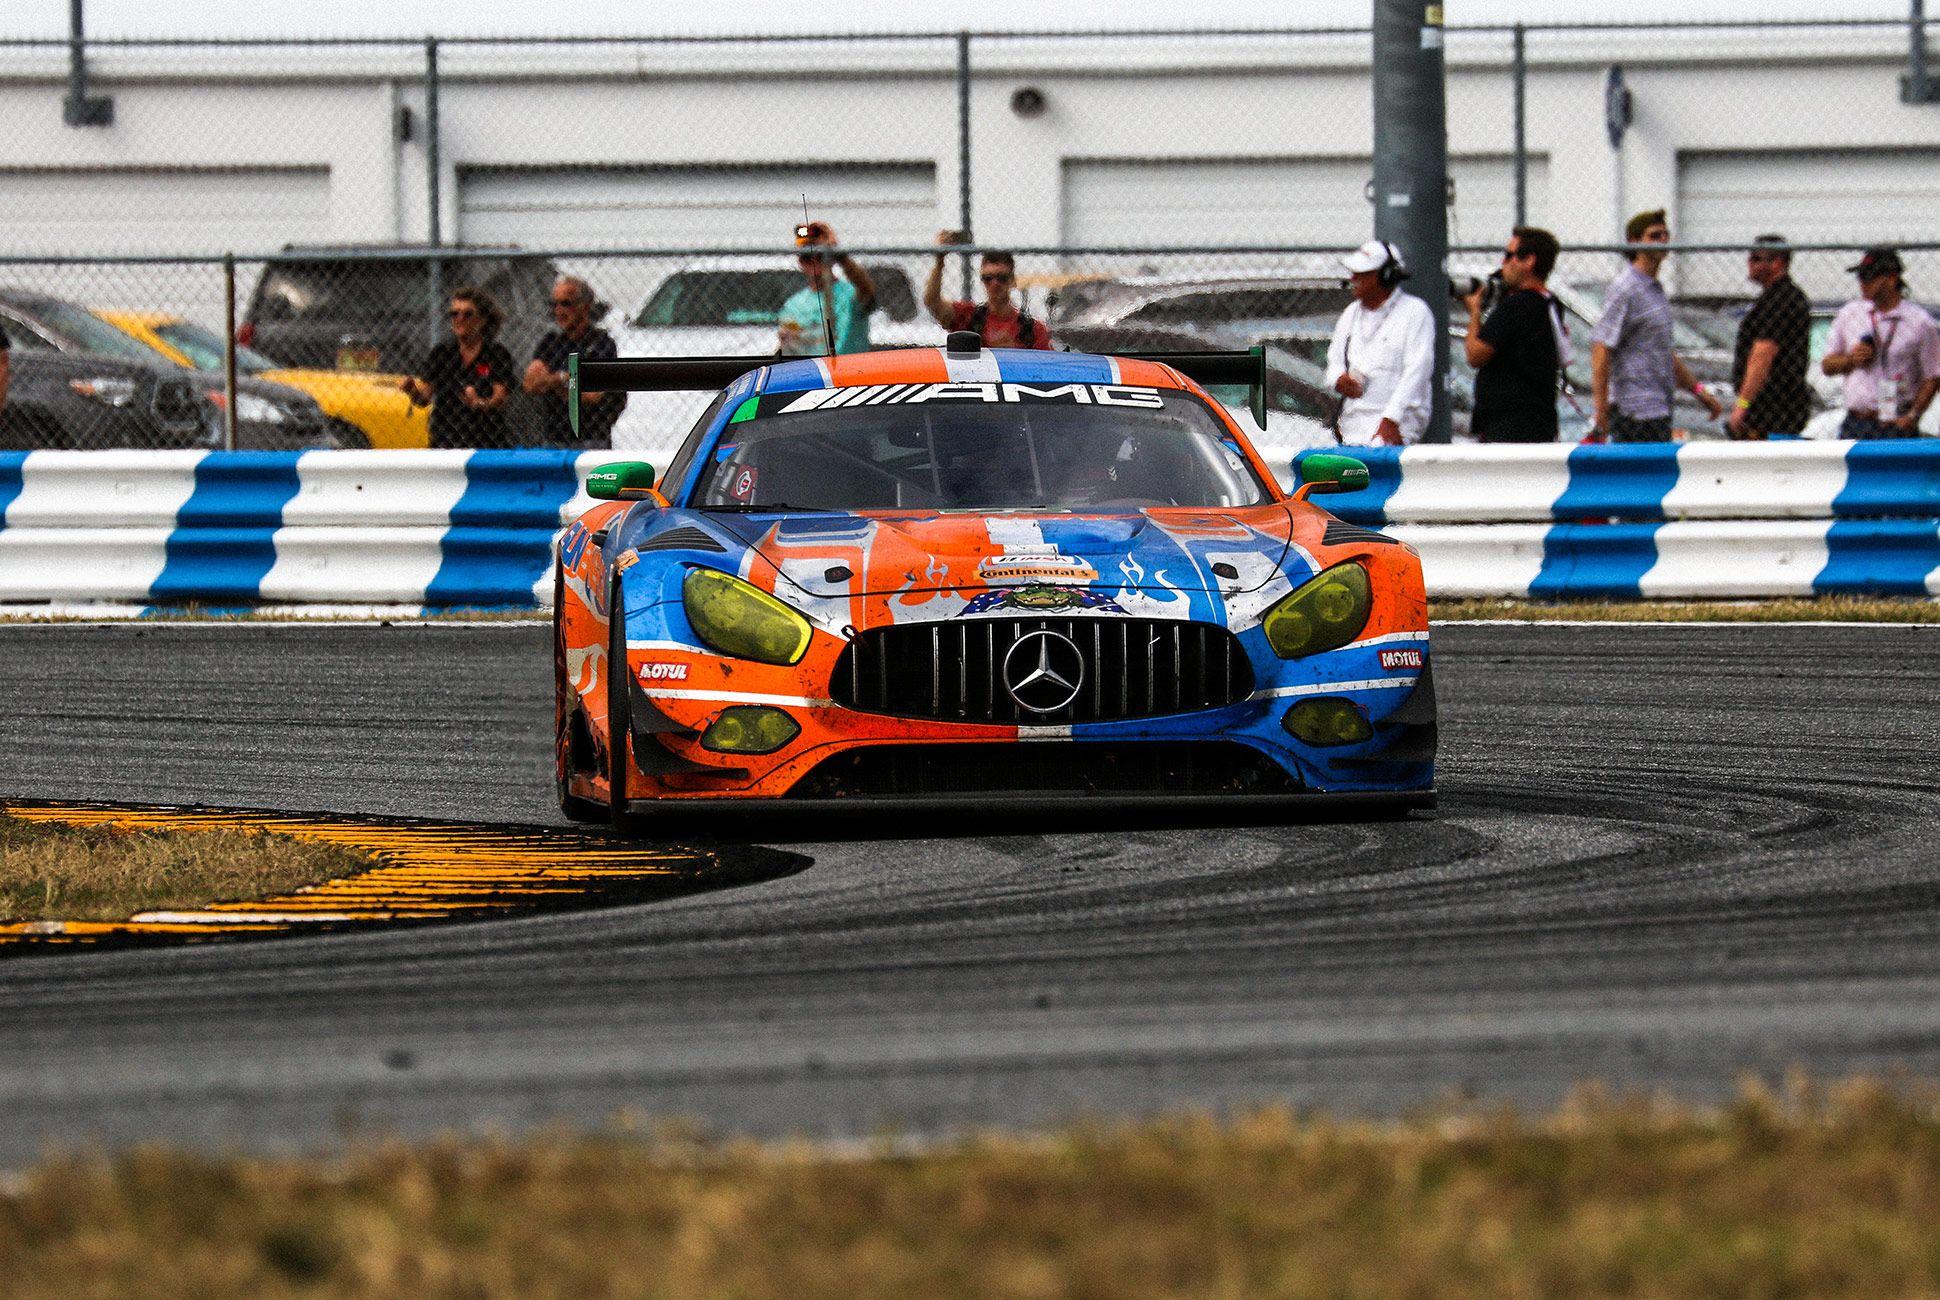 Best-Sports-Cars-of-2018-Daytona-24-Hours-gear-patrol-Mercedes-AMG-GT3-2